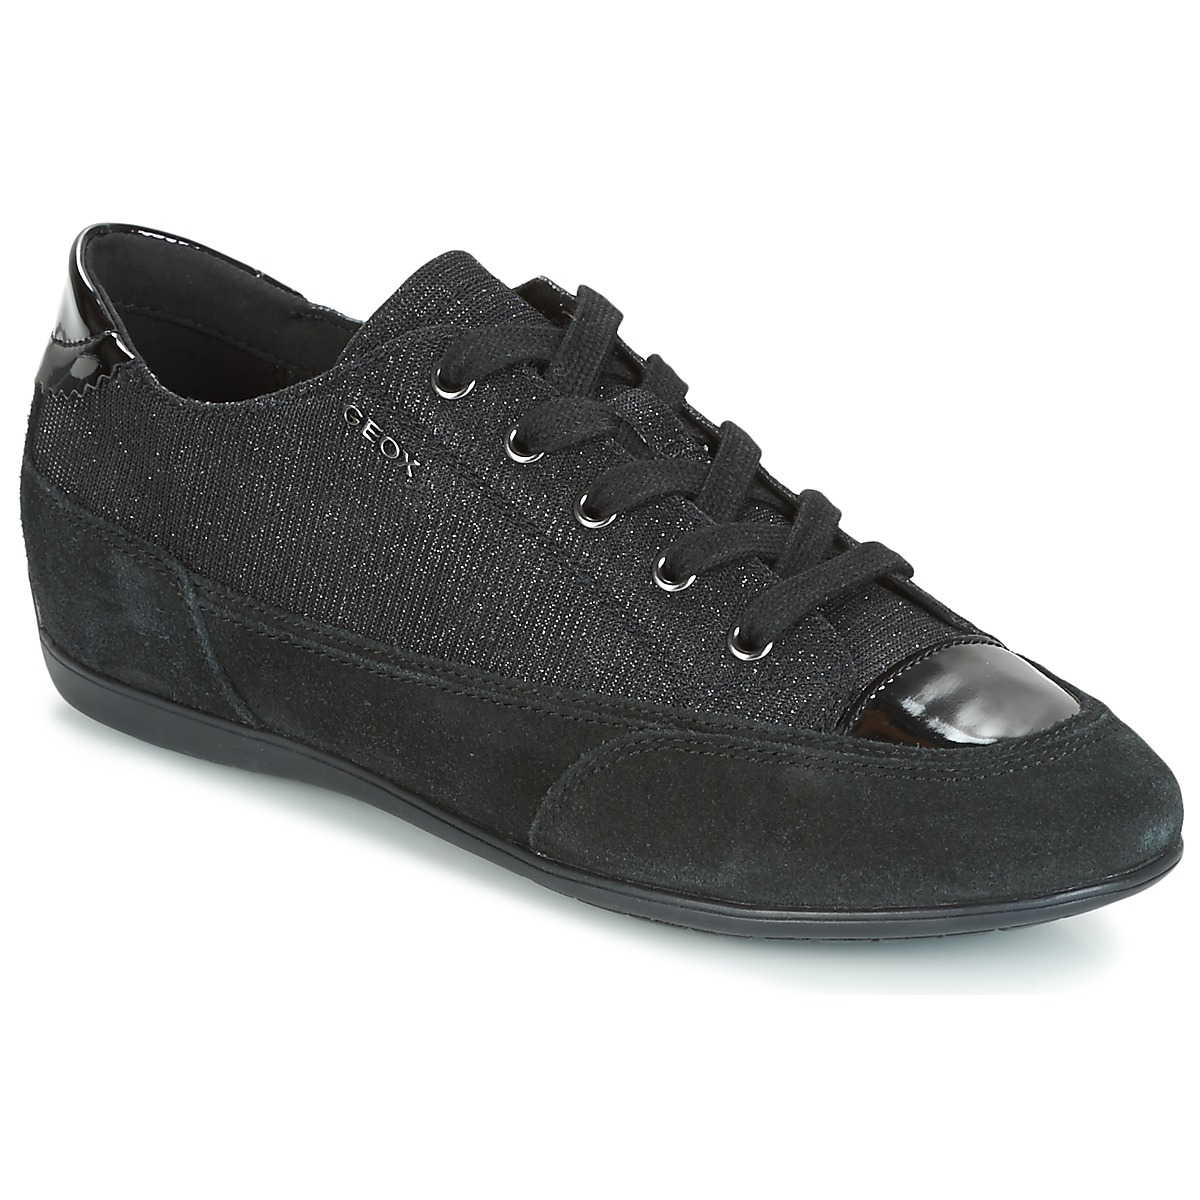 Geox D NEW MOENA Schwarz - Kostenloser Versand bei Spartoode ! - Schuhe Sneaker Low Damen 87,20 €